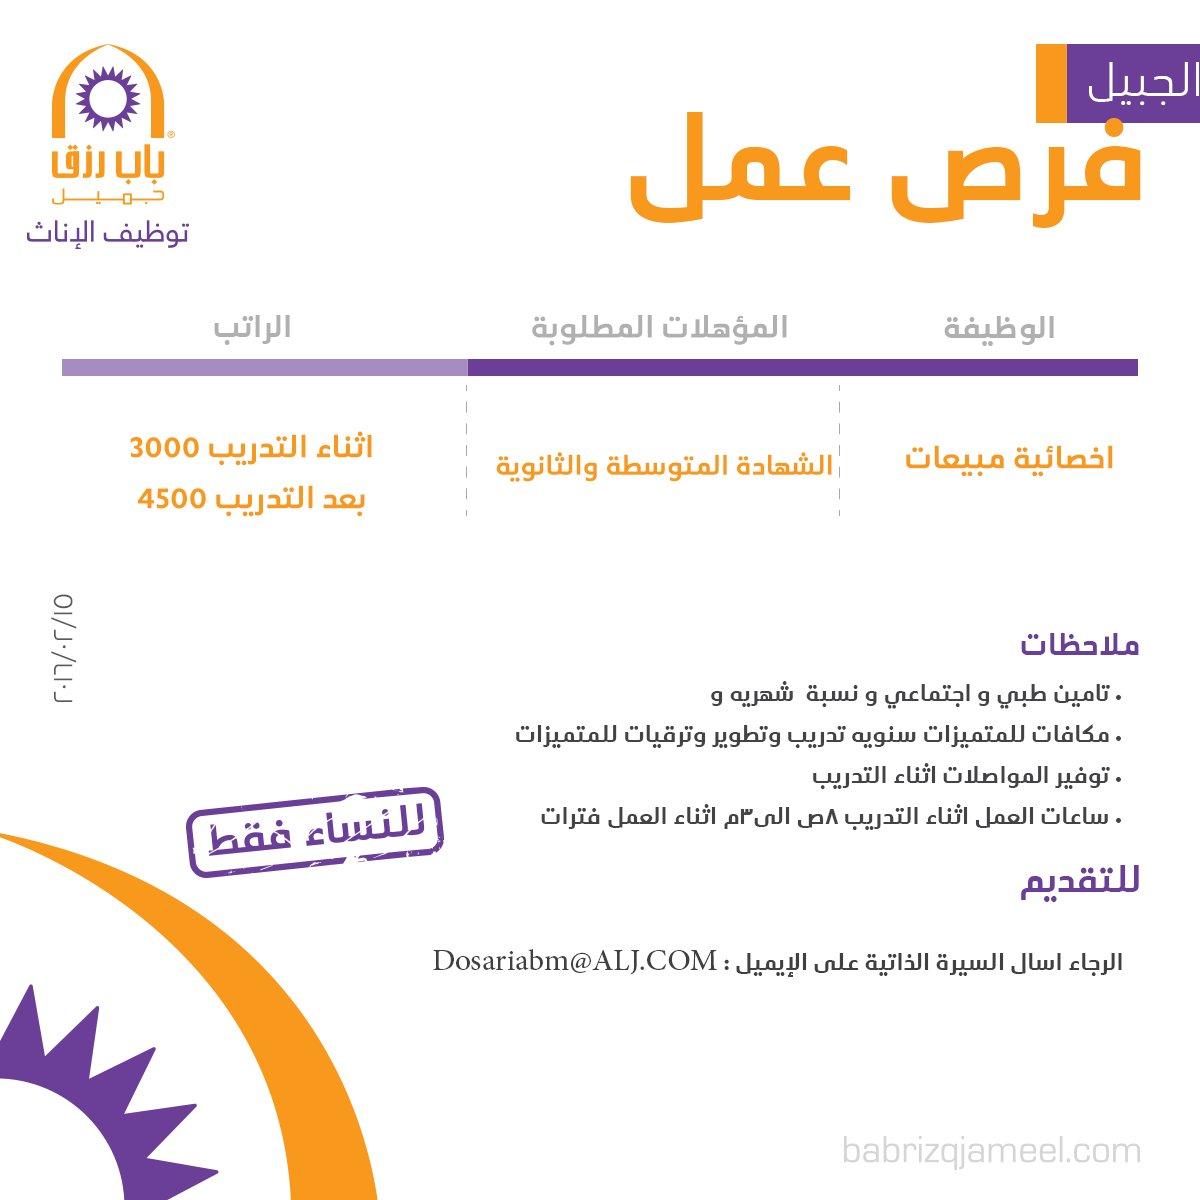 0bf51d98a #وظائف للسيدات في #الجبيل - اخصائية مبيعات #توظيف #توظيف_الإناث #ة  #باب_رزق_جميلpic.twitter.com/6P5VMHkA6c